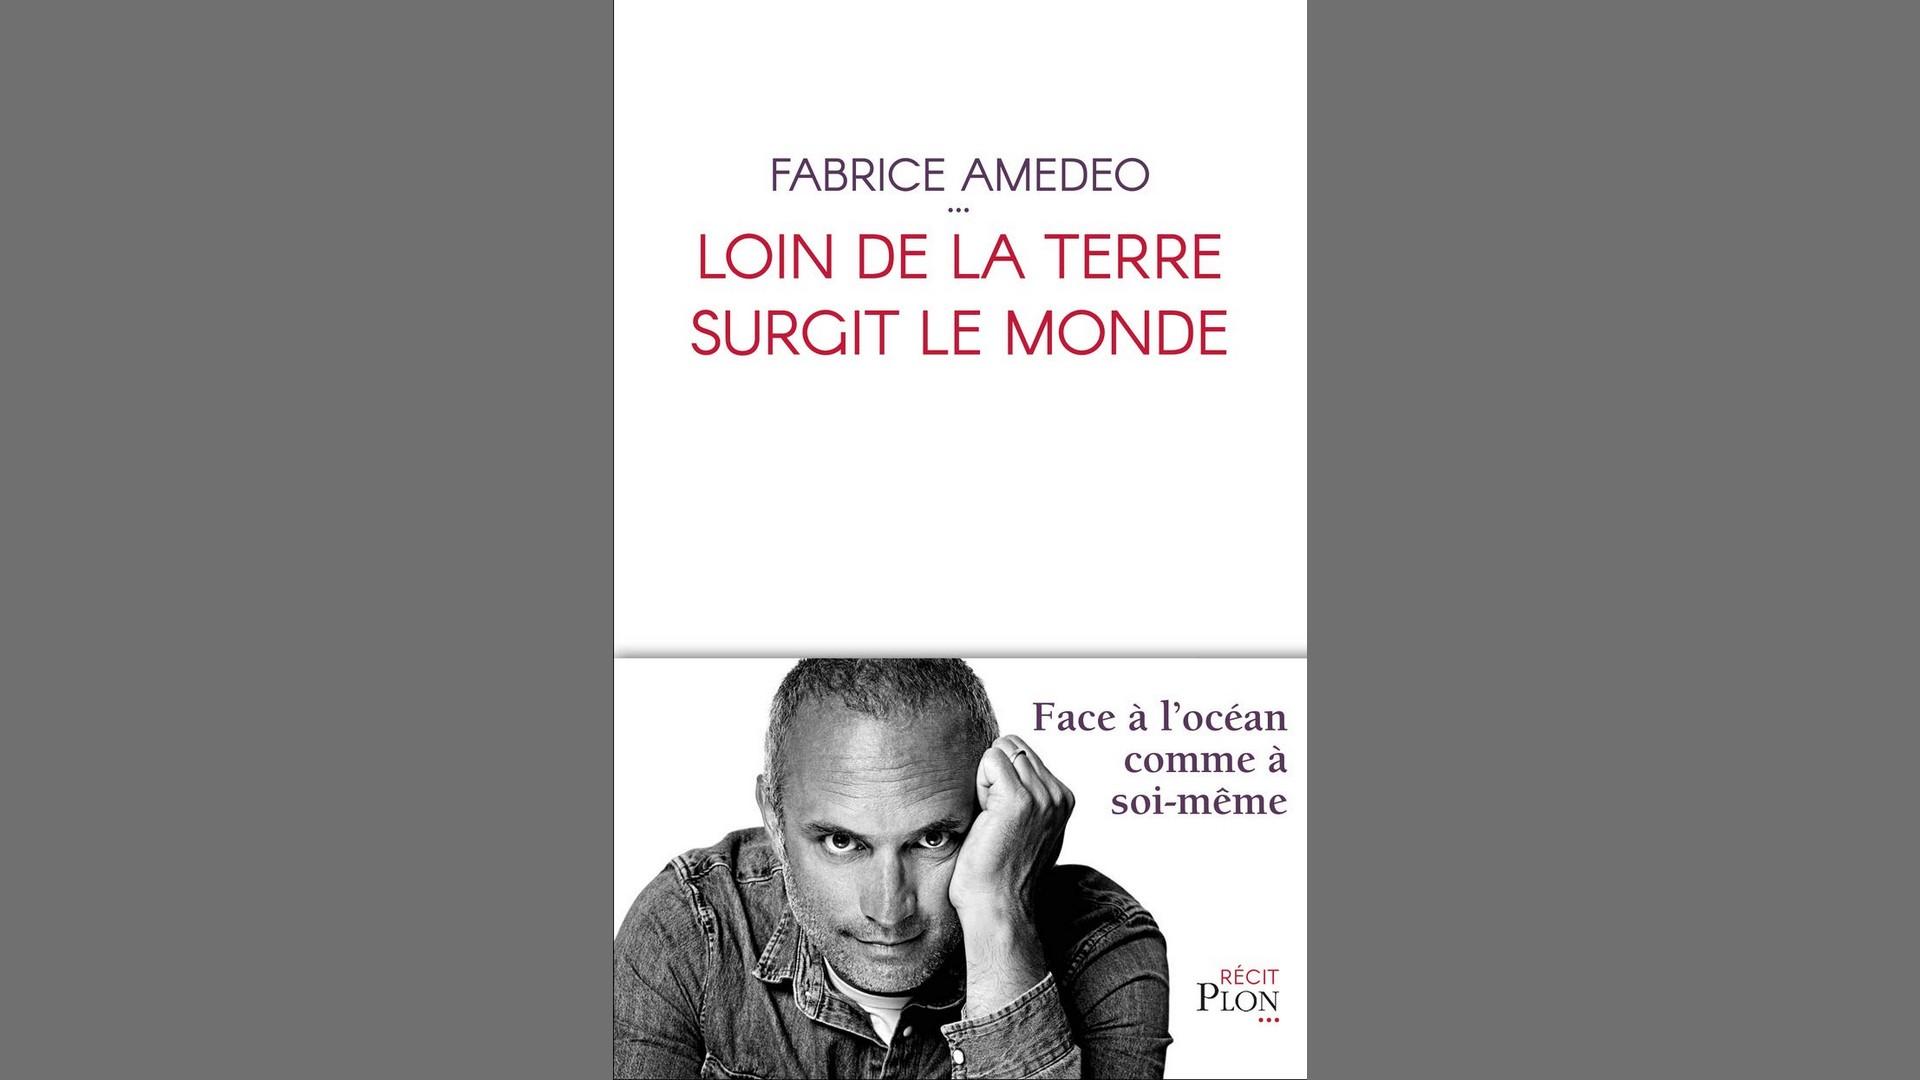 Livres – Fabrice Amedeo – Loin de la terre surgit le monde (2020)